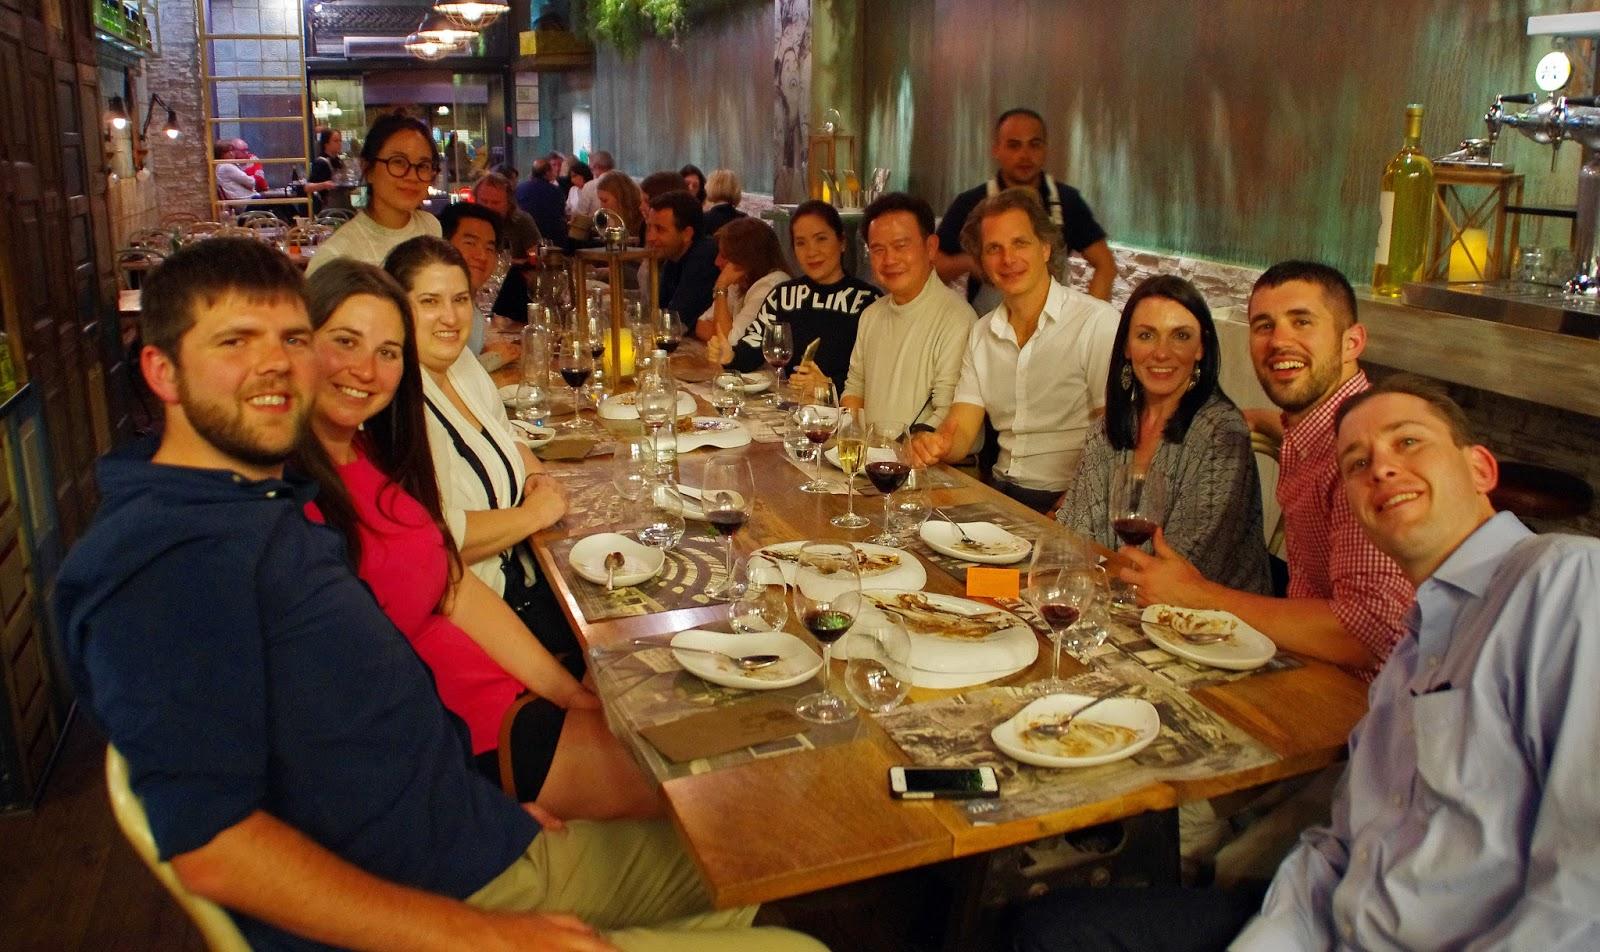 Group on Food Lover Tour Barcelona